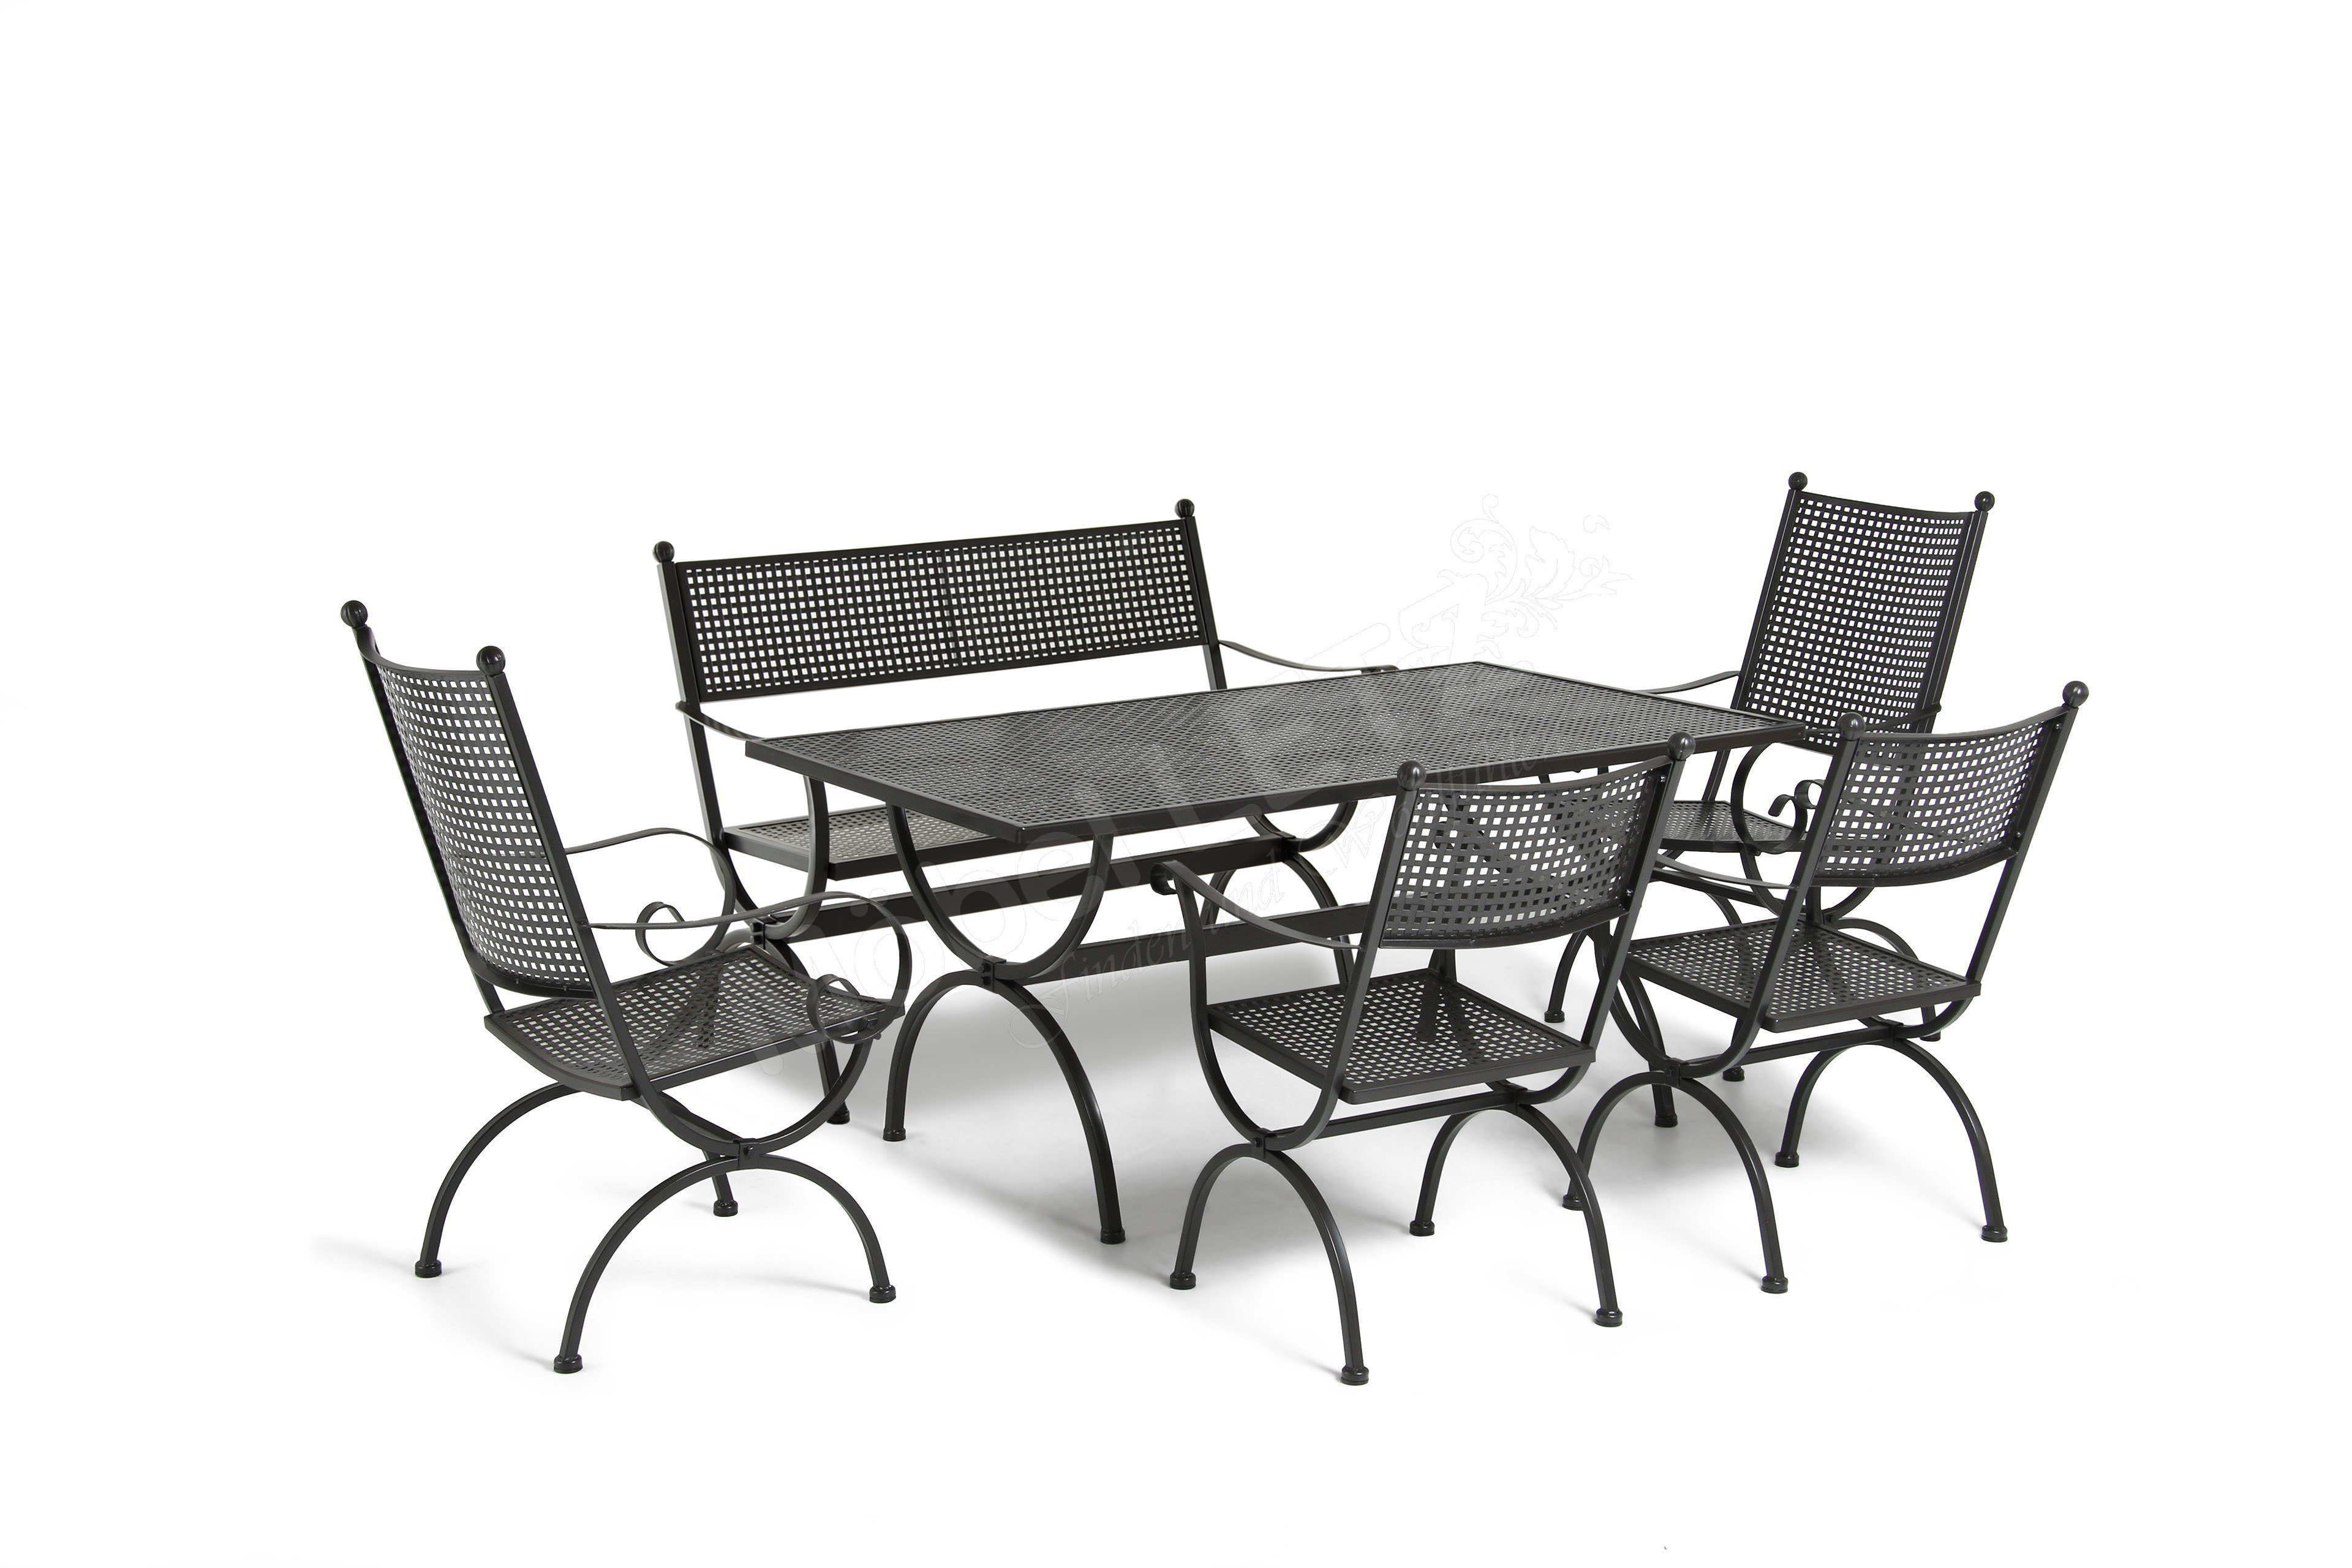 mbm tisch romeo m bel letz ihr online shop. Black Bedroom Furniture Sets. Home Design Ideas